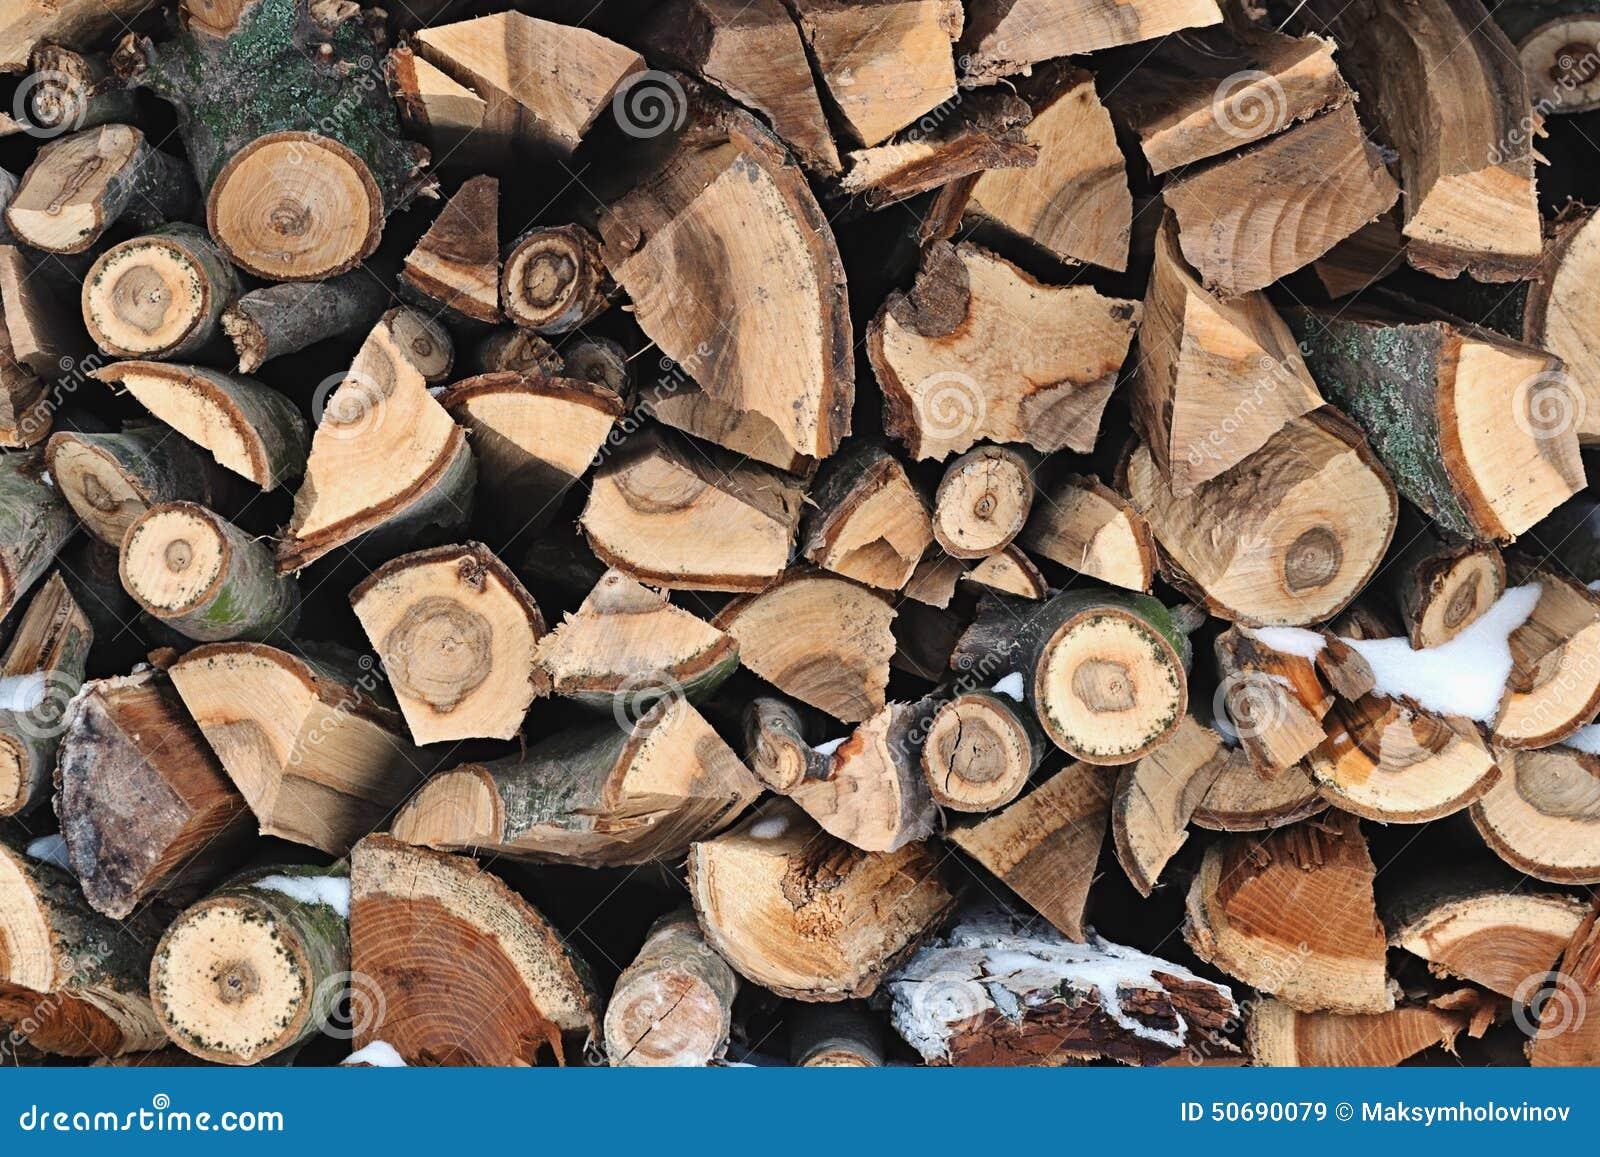 Download 堆木柴 库存图片. 图片 包括有 冬天, 破裂, 季节, 收获, 干燥, 已分解, 户外, 堆积, 核心 - 50690079